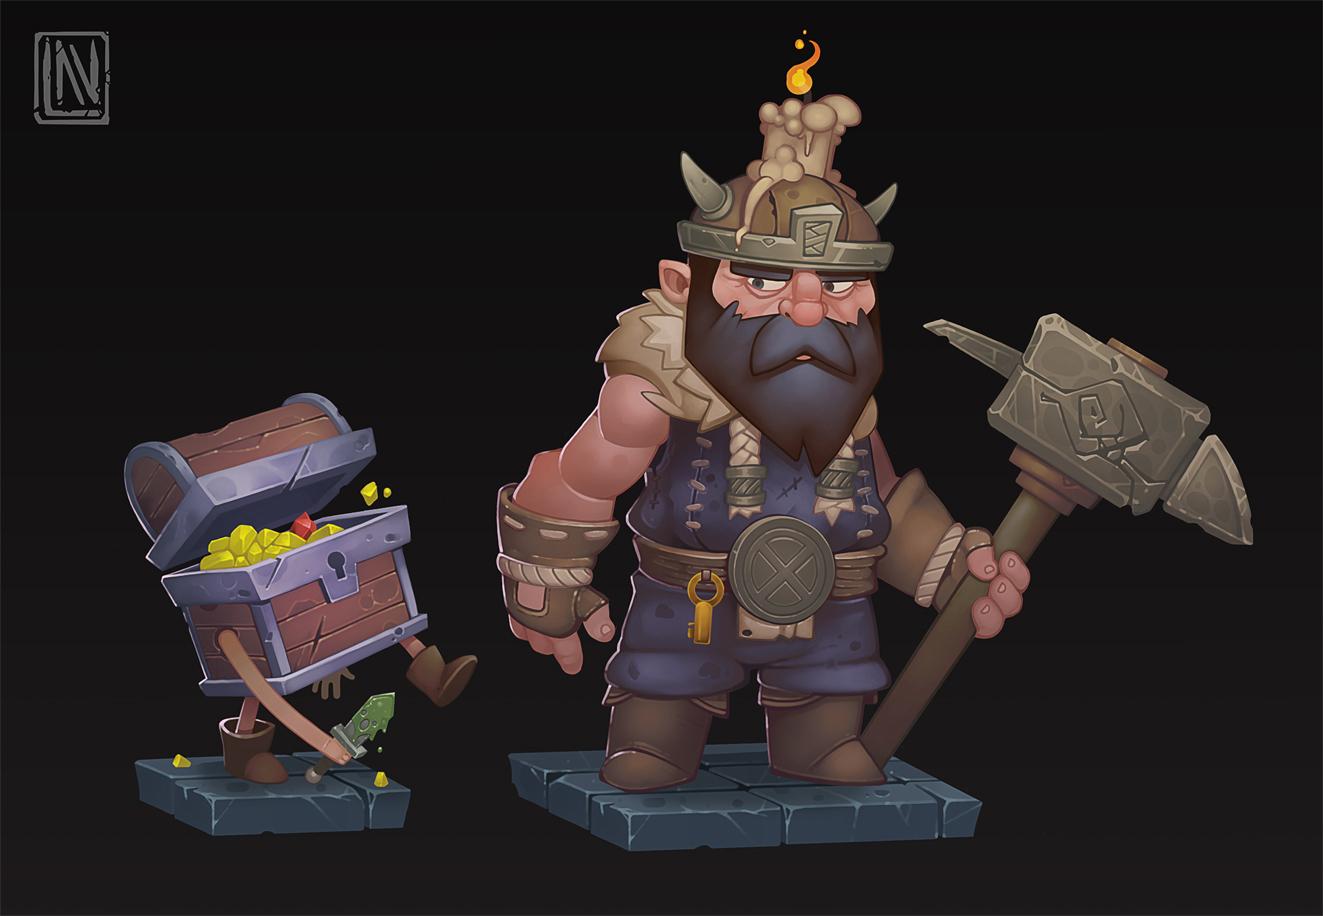 Brobeard and Lootman